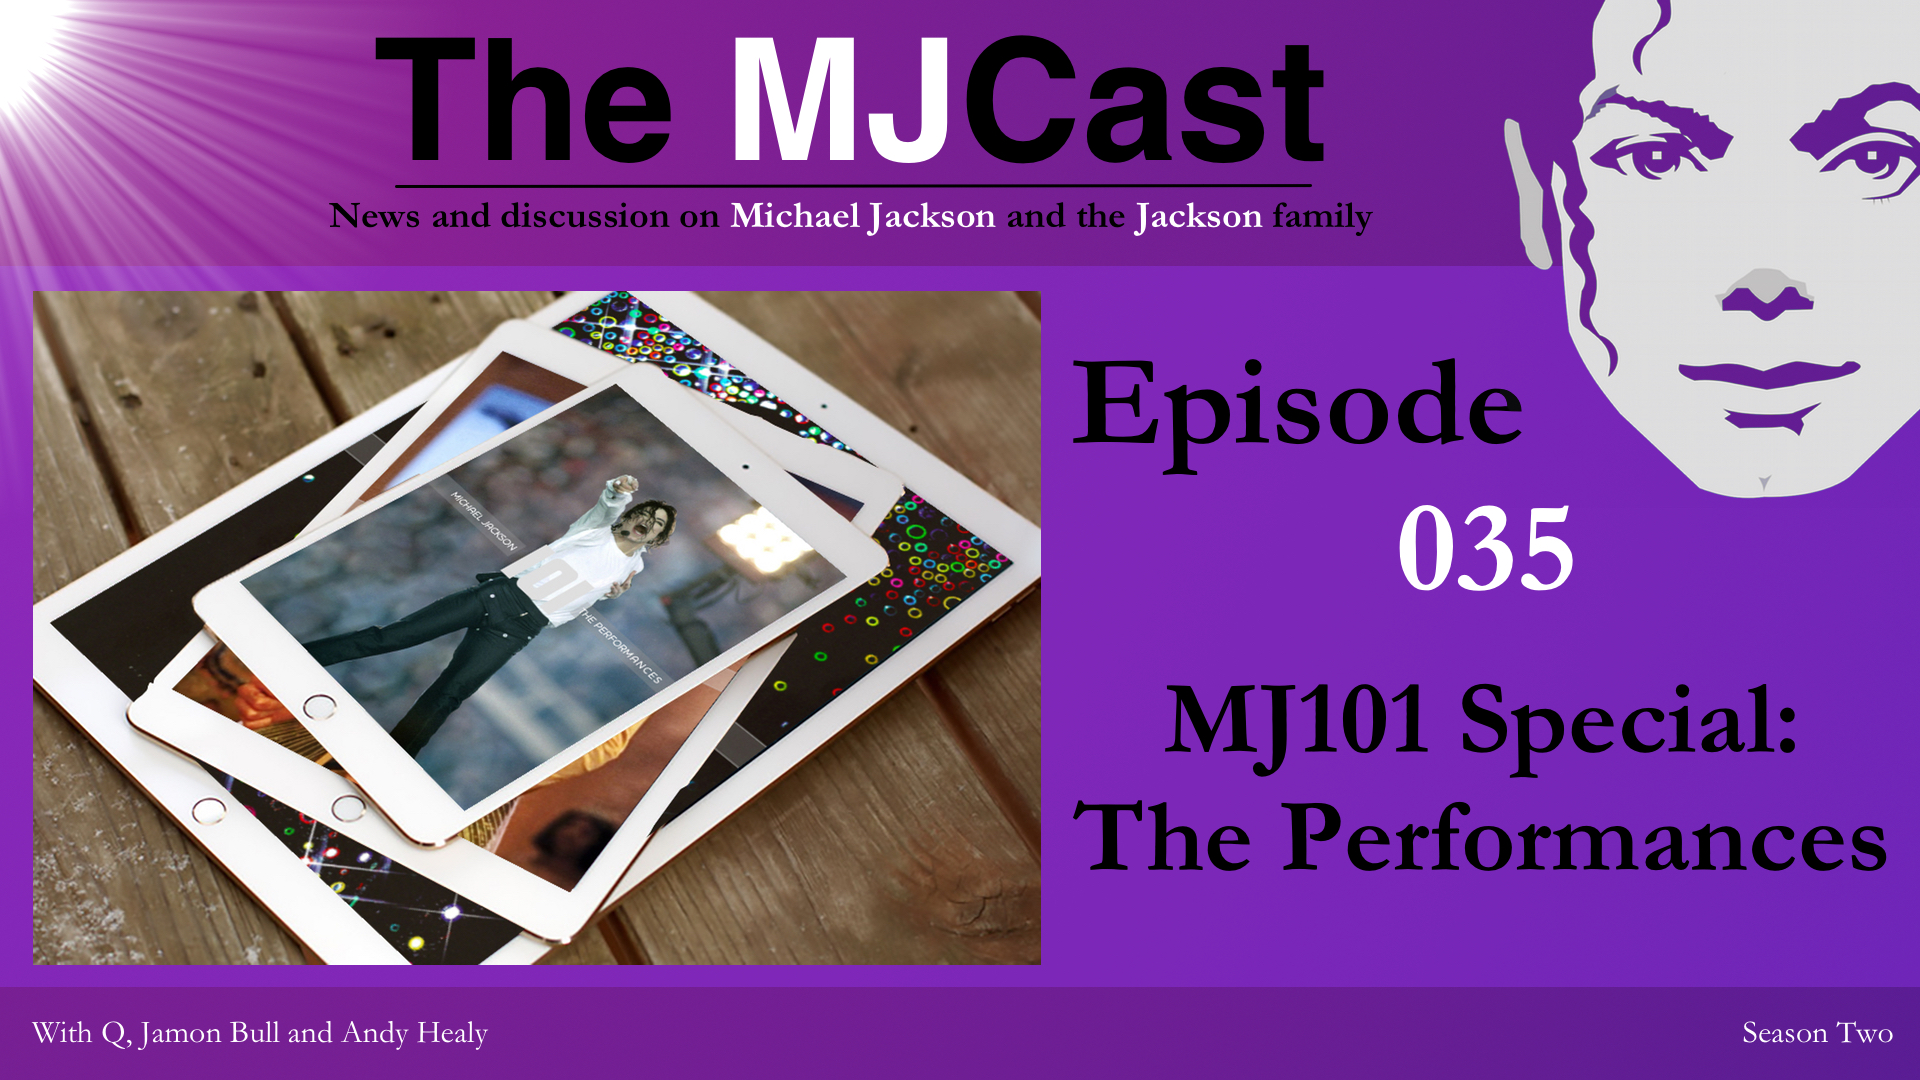 Episode 035 - MJ101 Special - The Performances Show Art